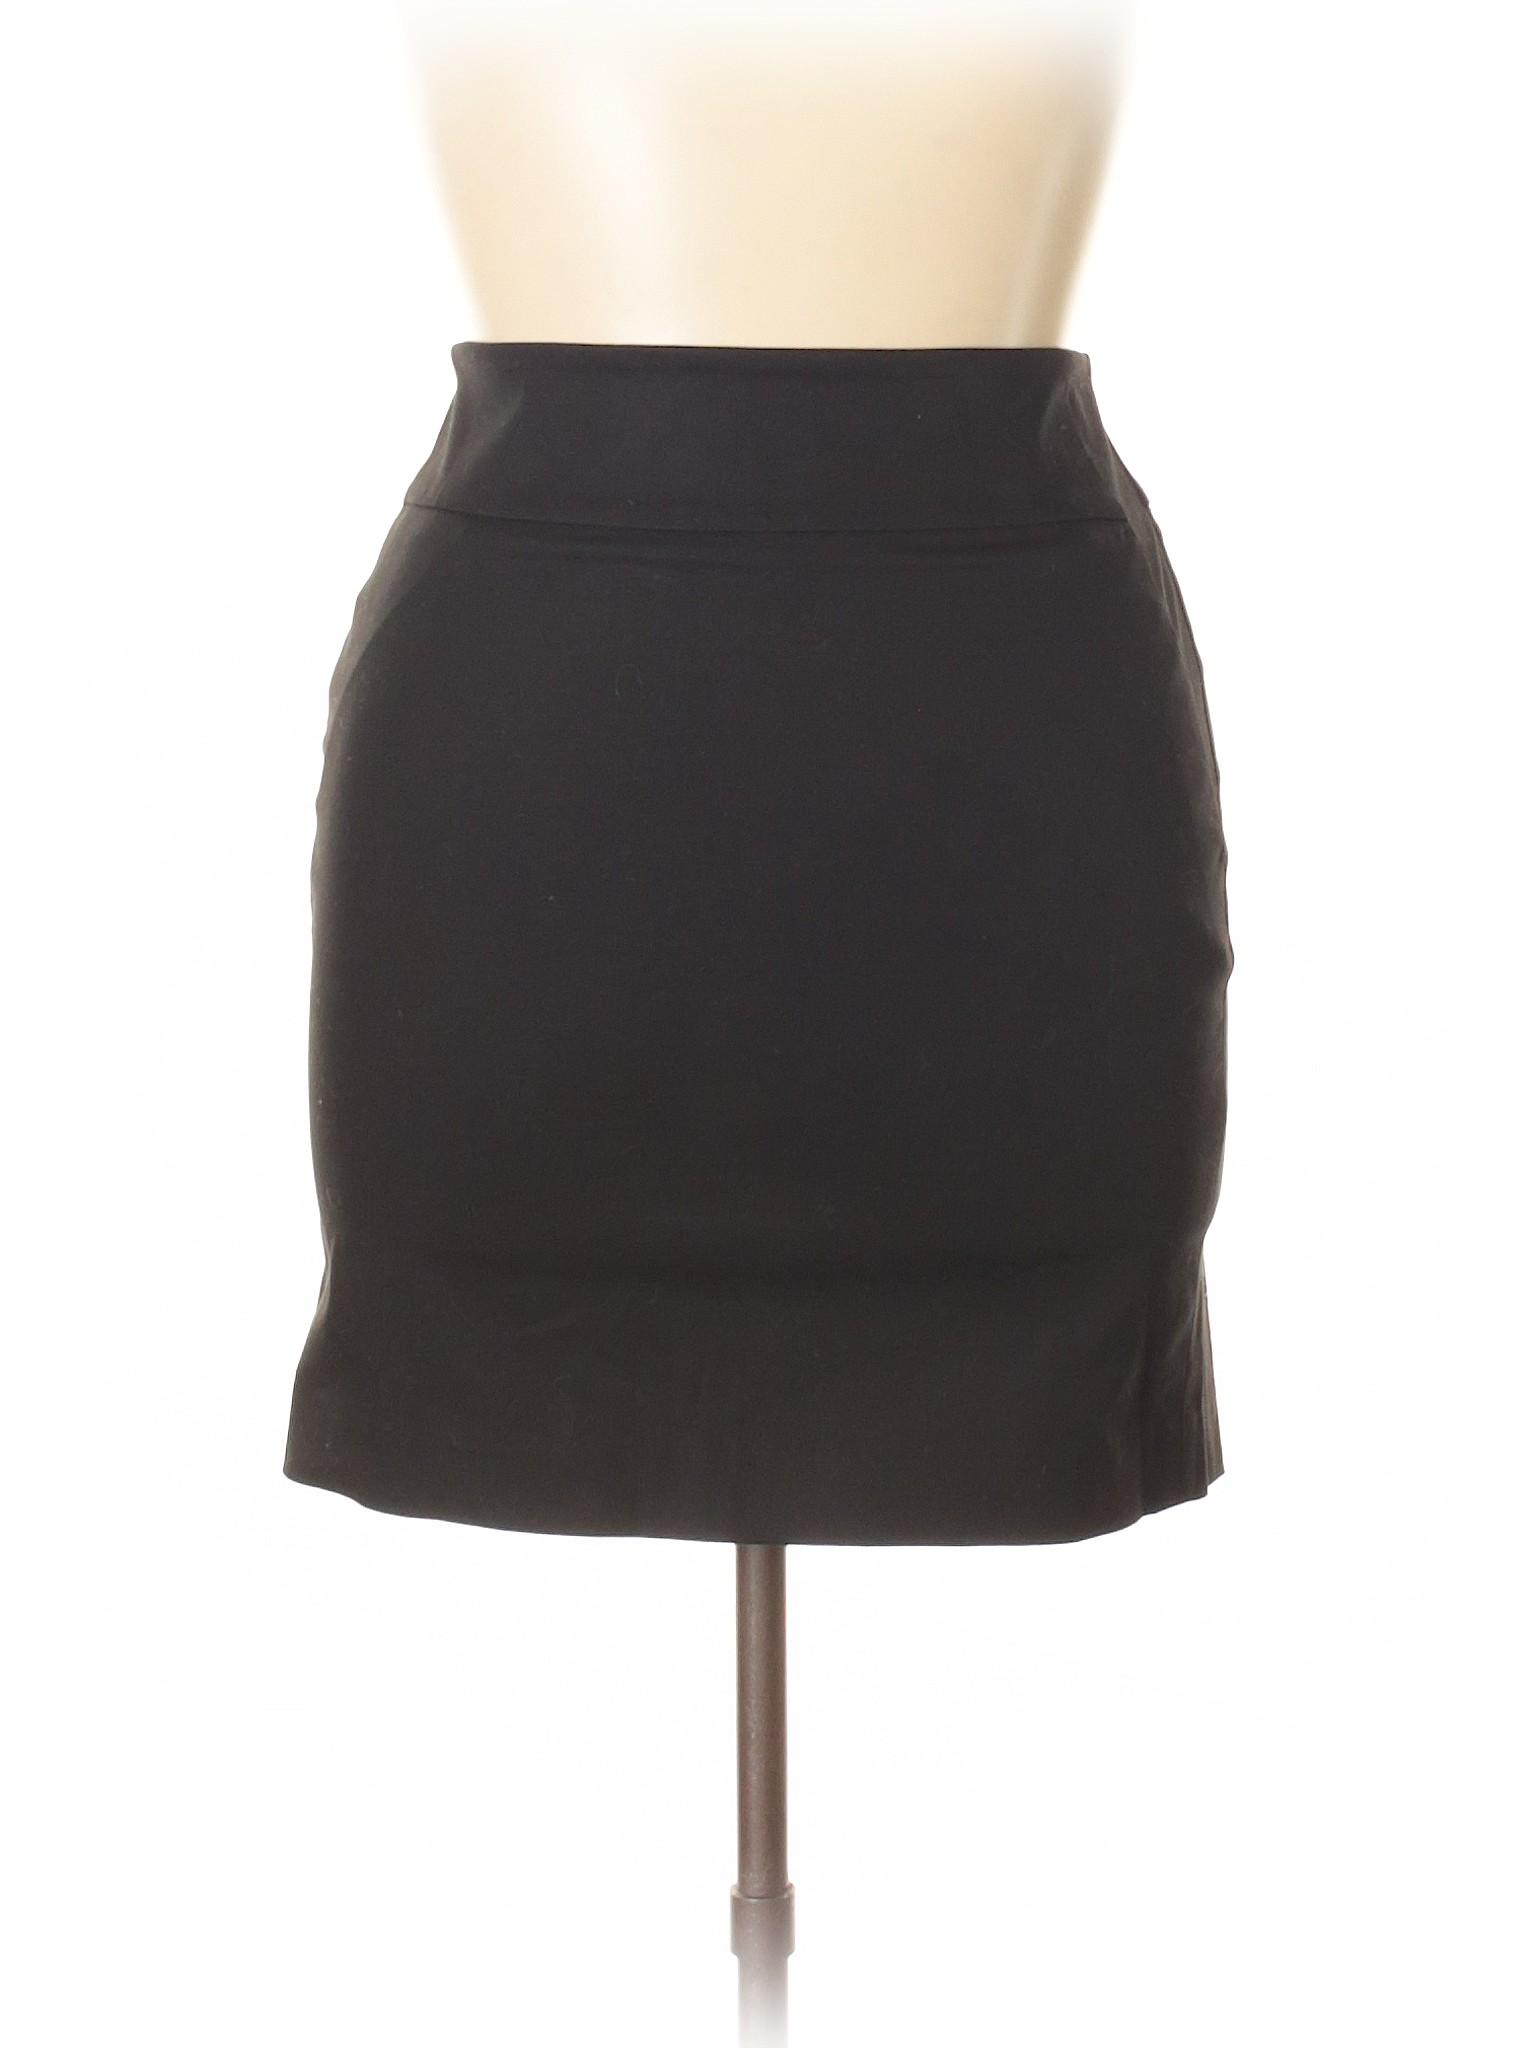 Casual Skirt Ann Boutique Taylor leisure wqPxAp1